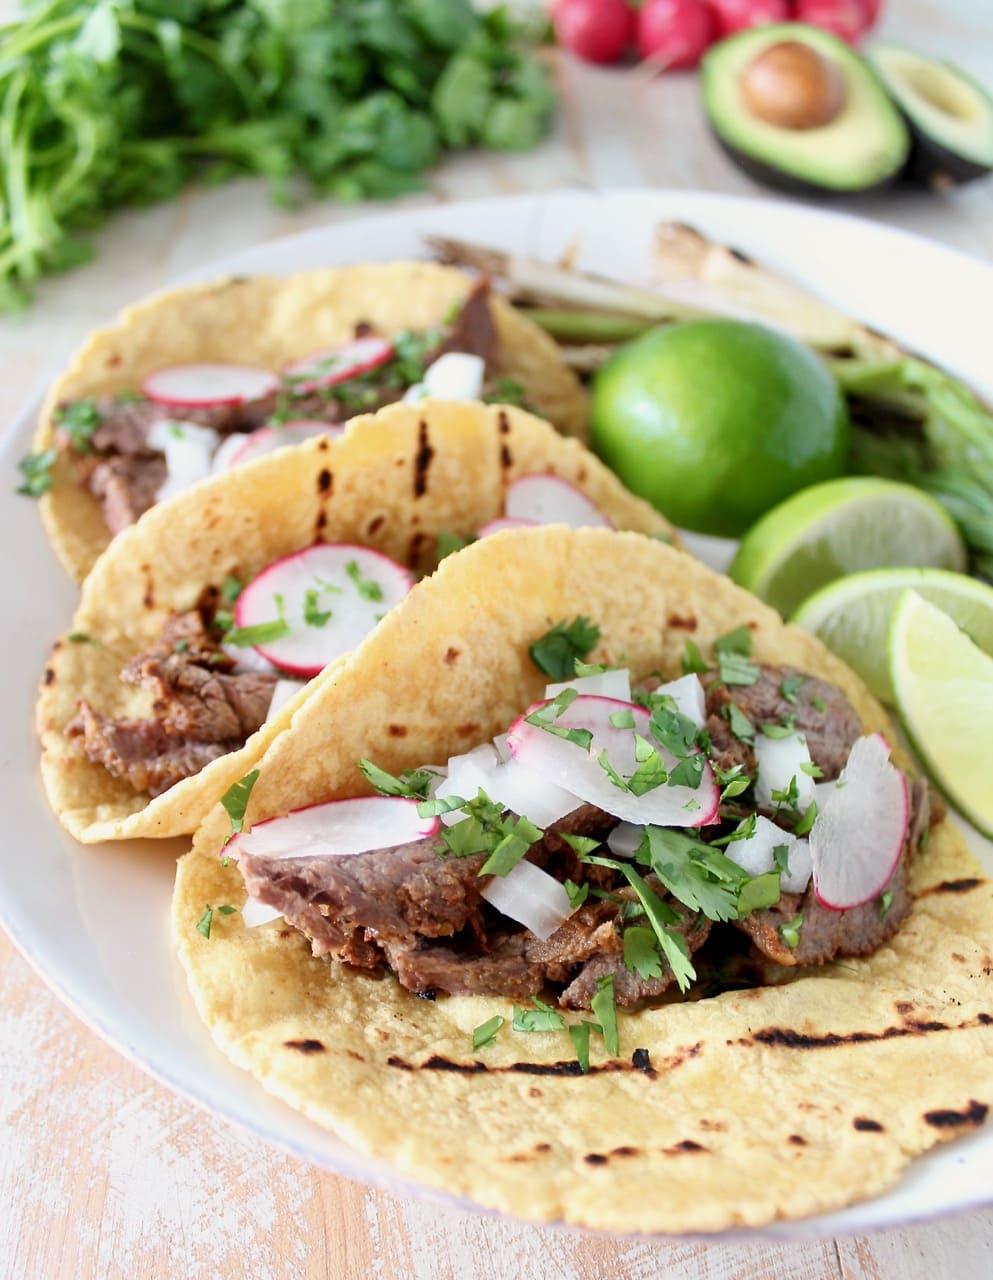 Carne Asada Tacos with Cilantro, Onion and Radish